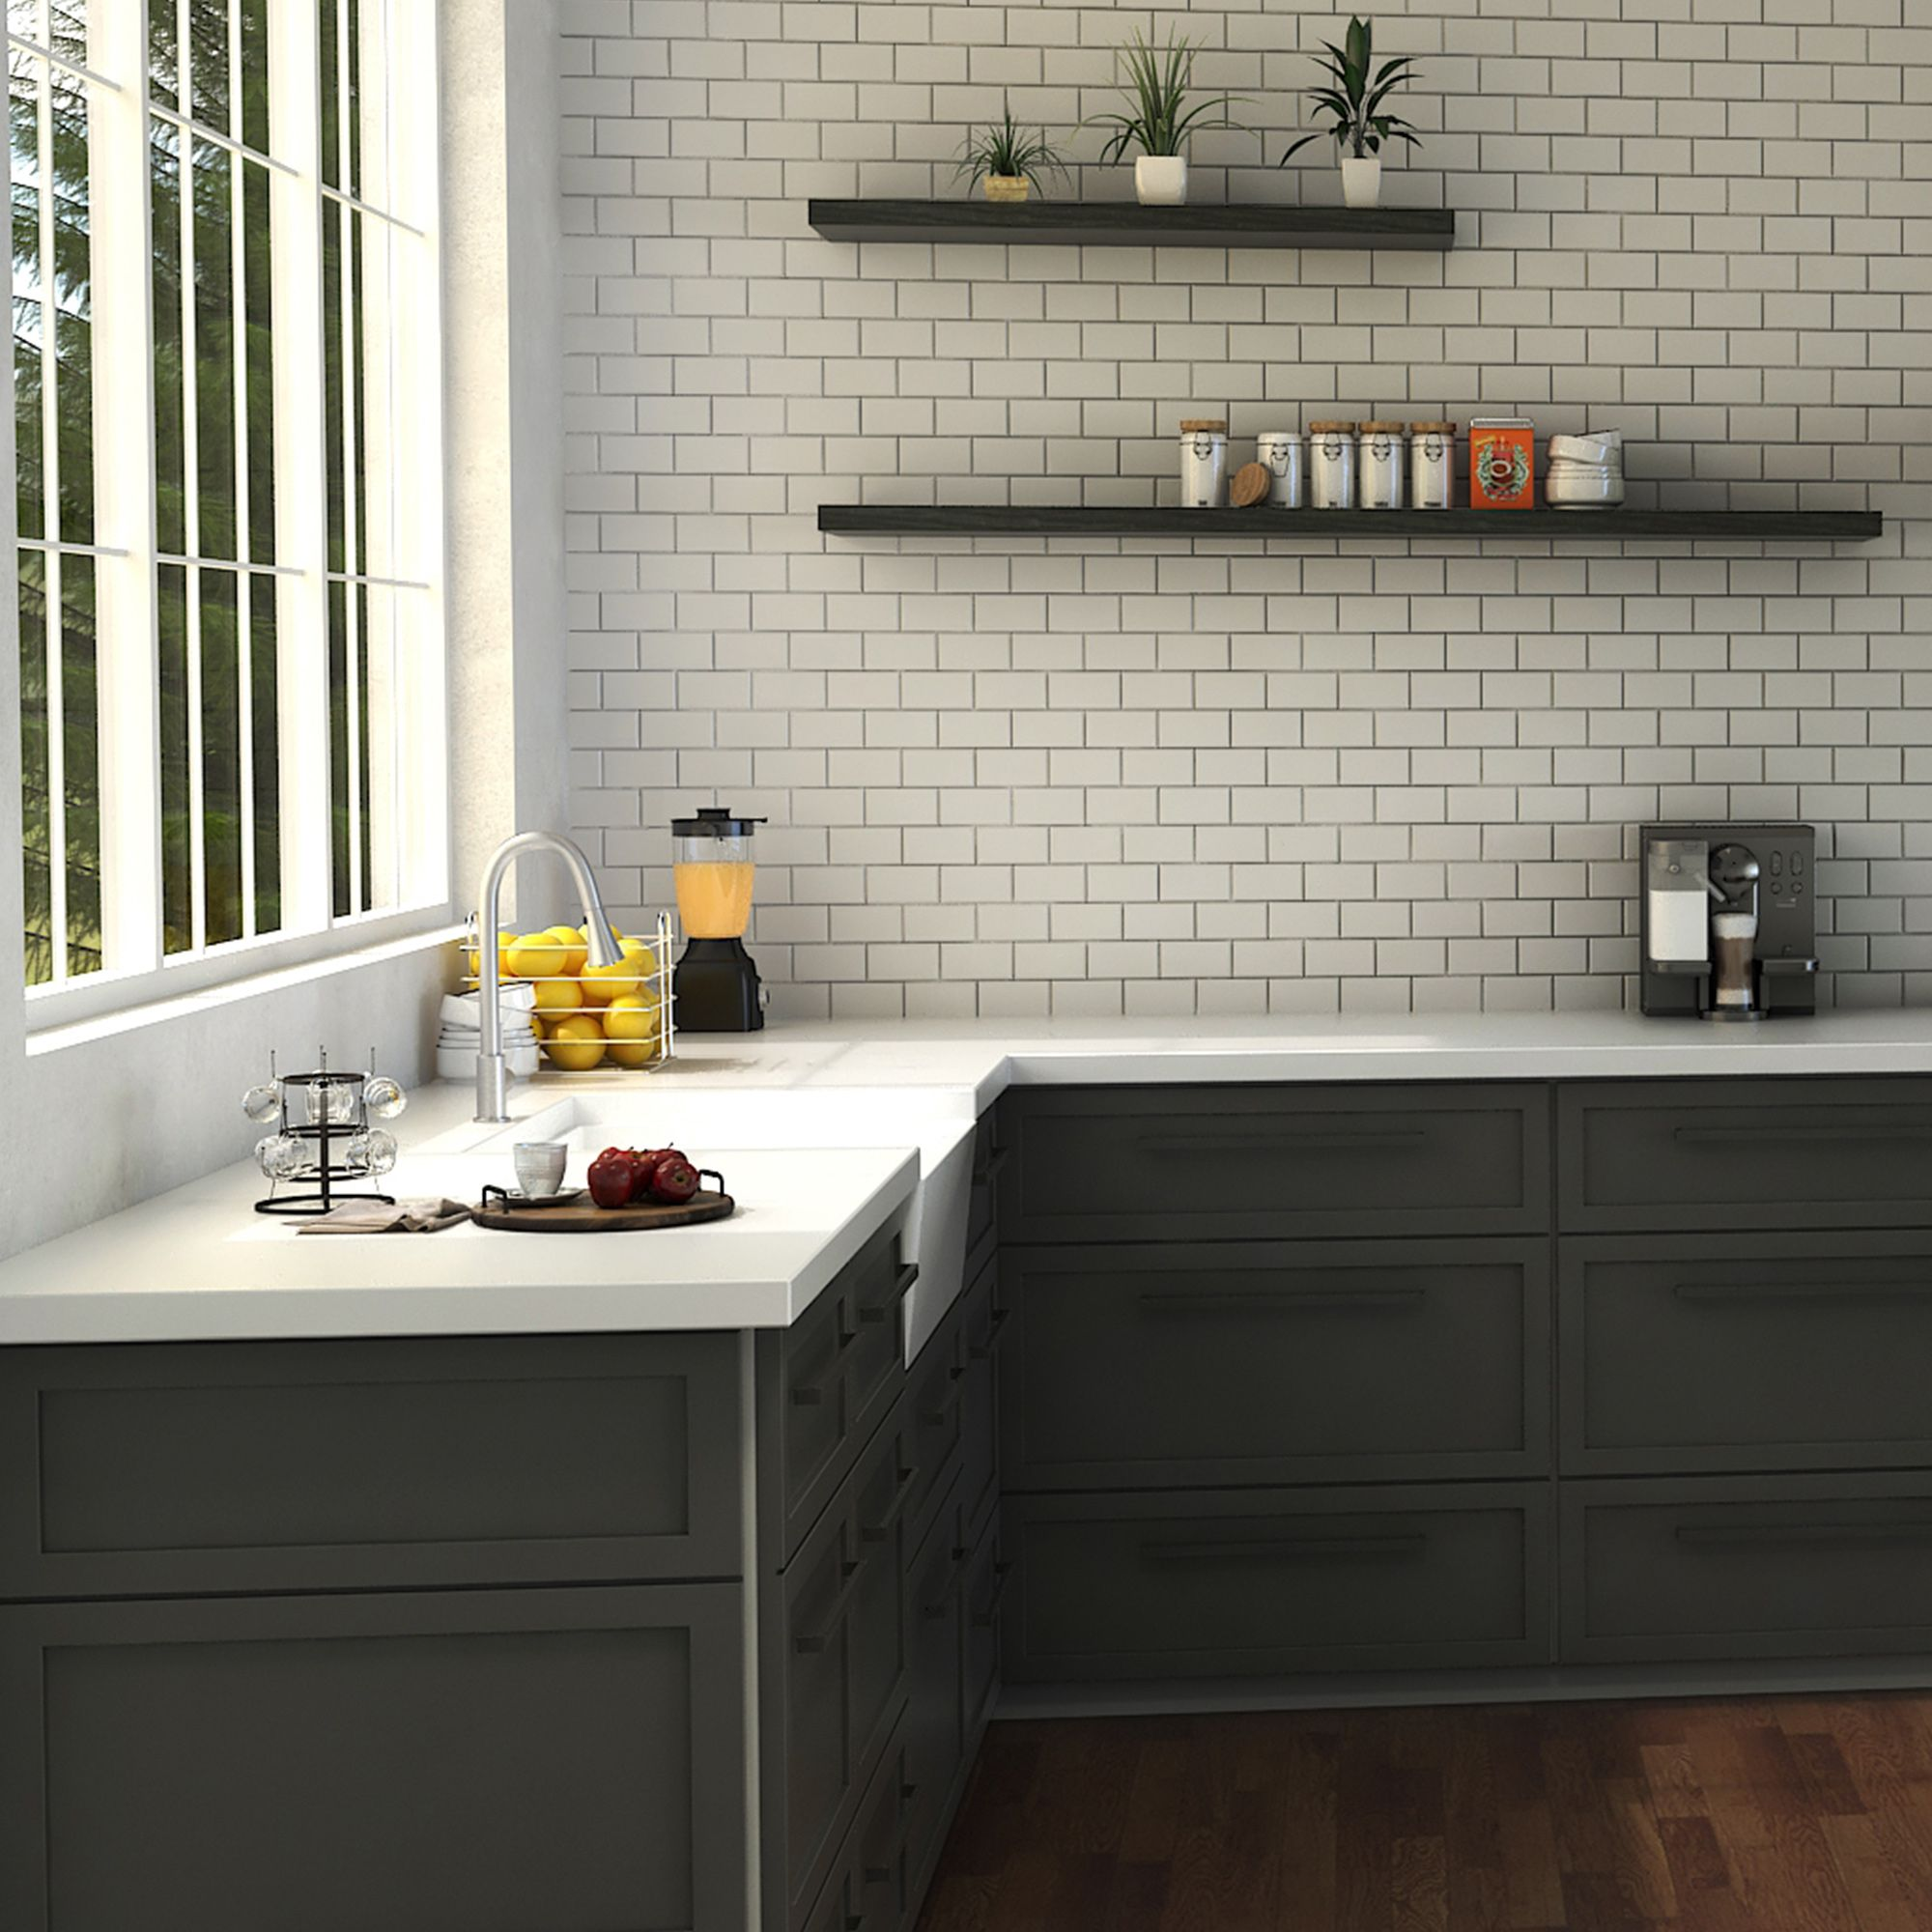 Zline Edison Kitchen Faucet In Brushed Nickel Eds Kf Bn Kitchen Faucet Design Edison Kitchen Faucet Kitchen Faucet